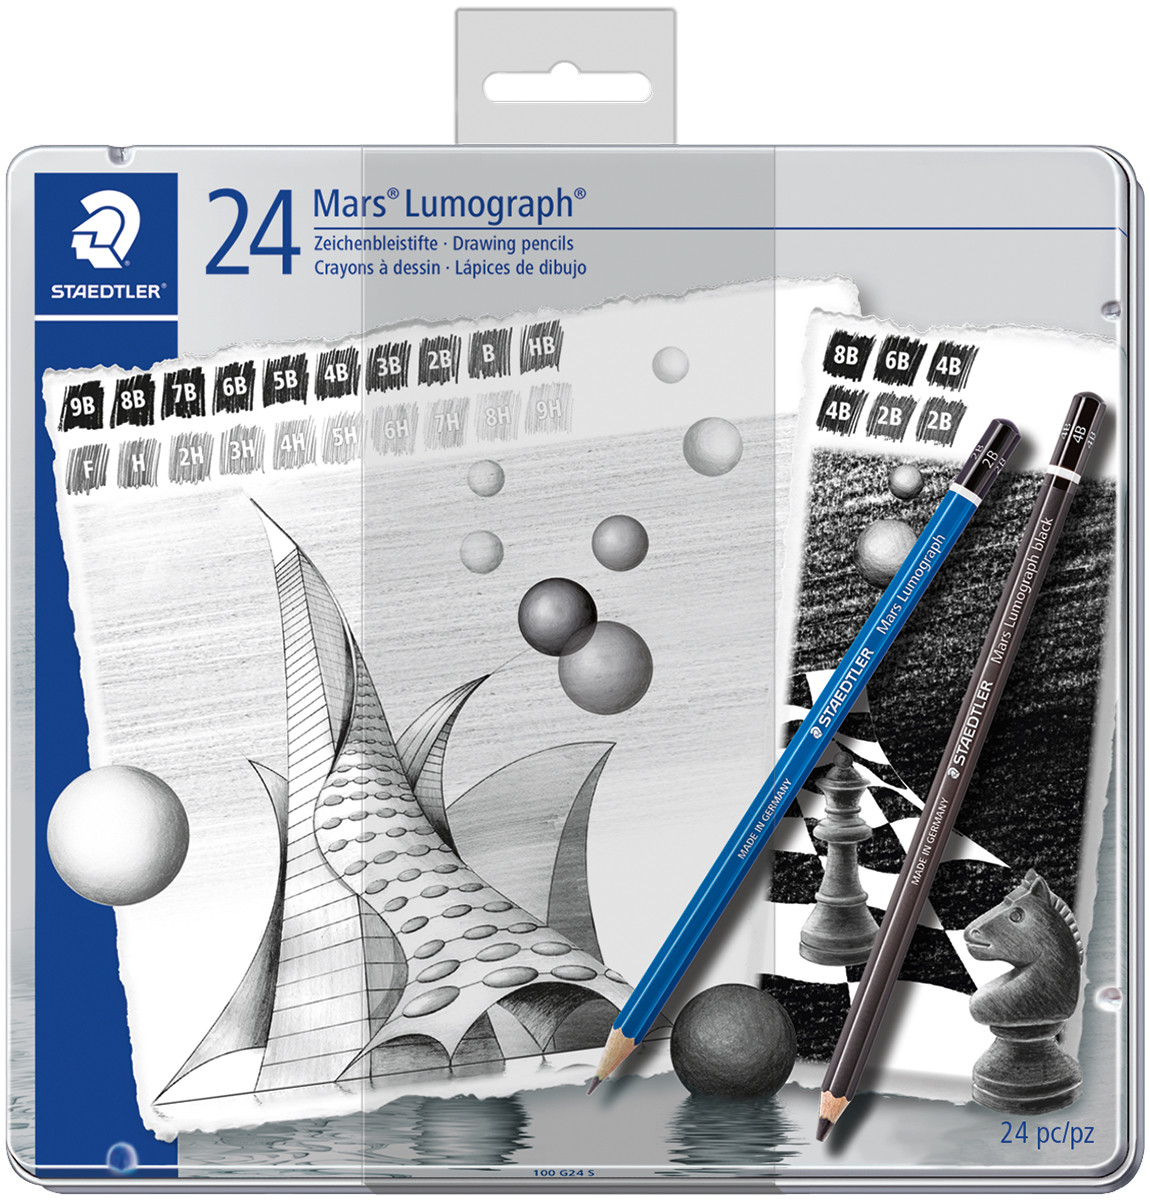 Staedtler Mars Lumograph Pencil Set - 20 Lumograph plus 4 Lumograph Black Pencils